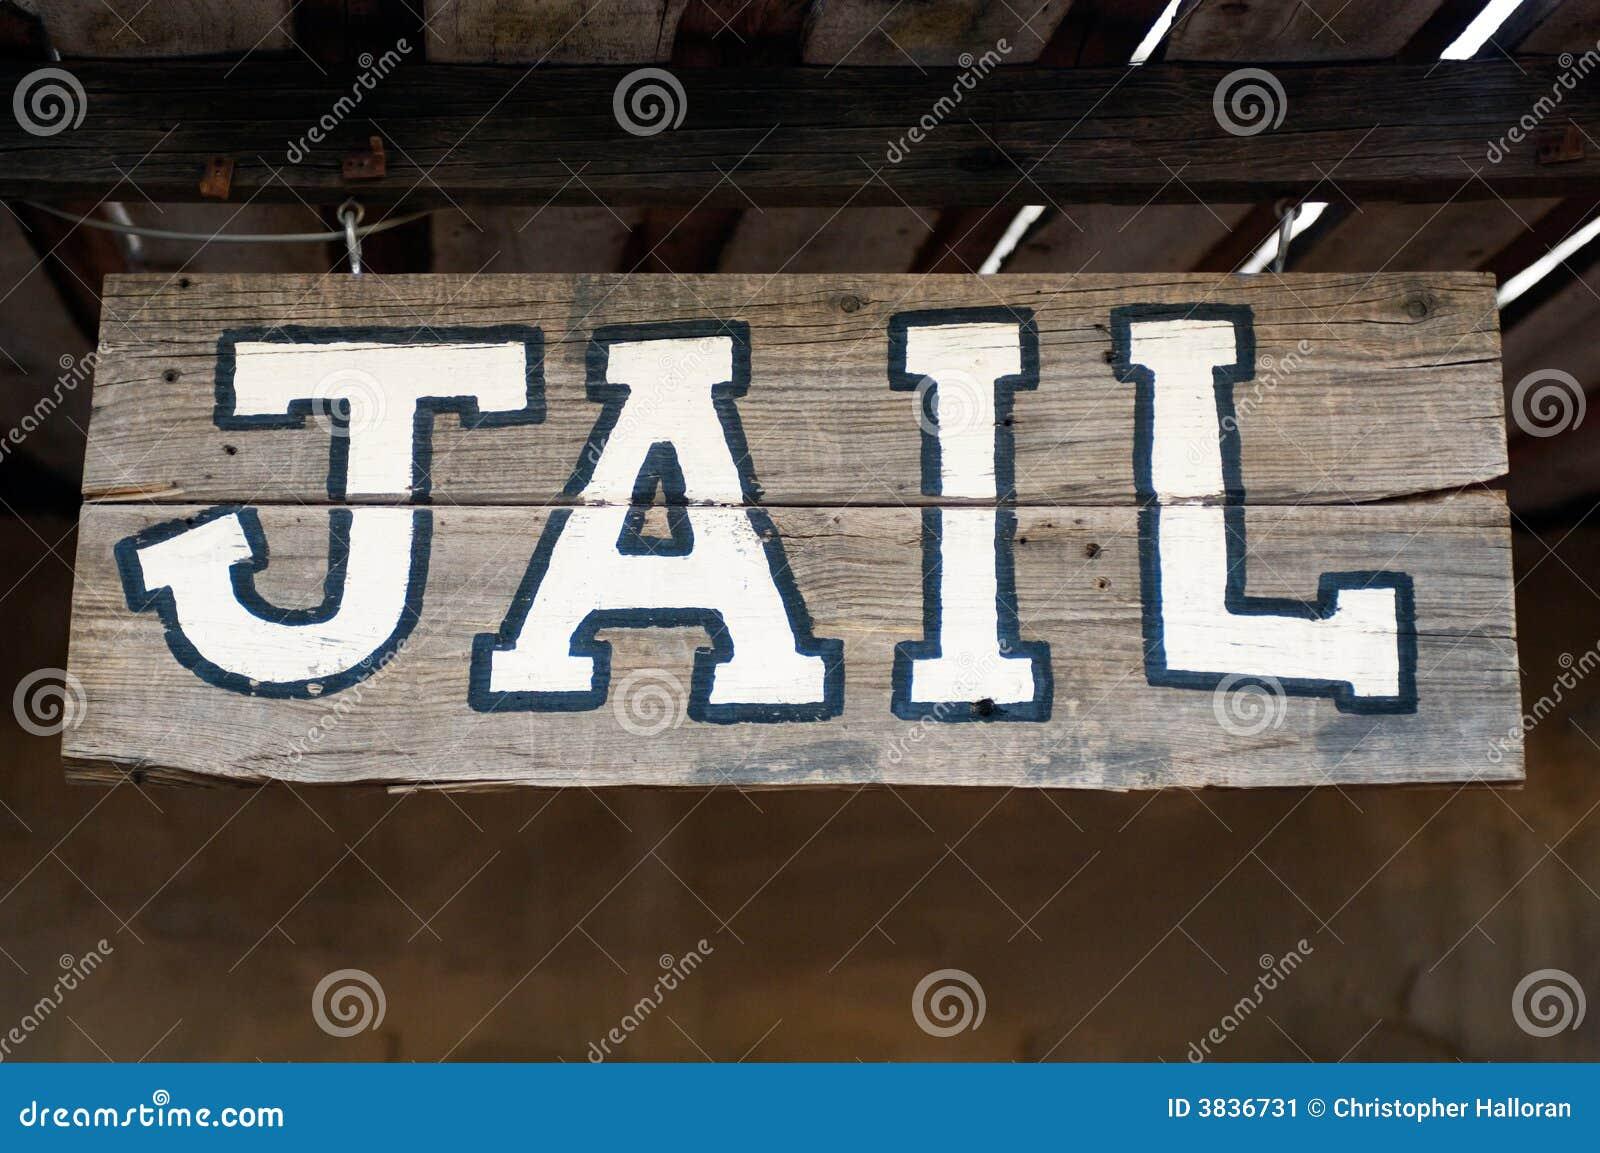 prison management styles